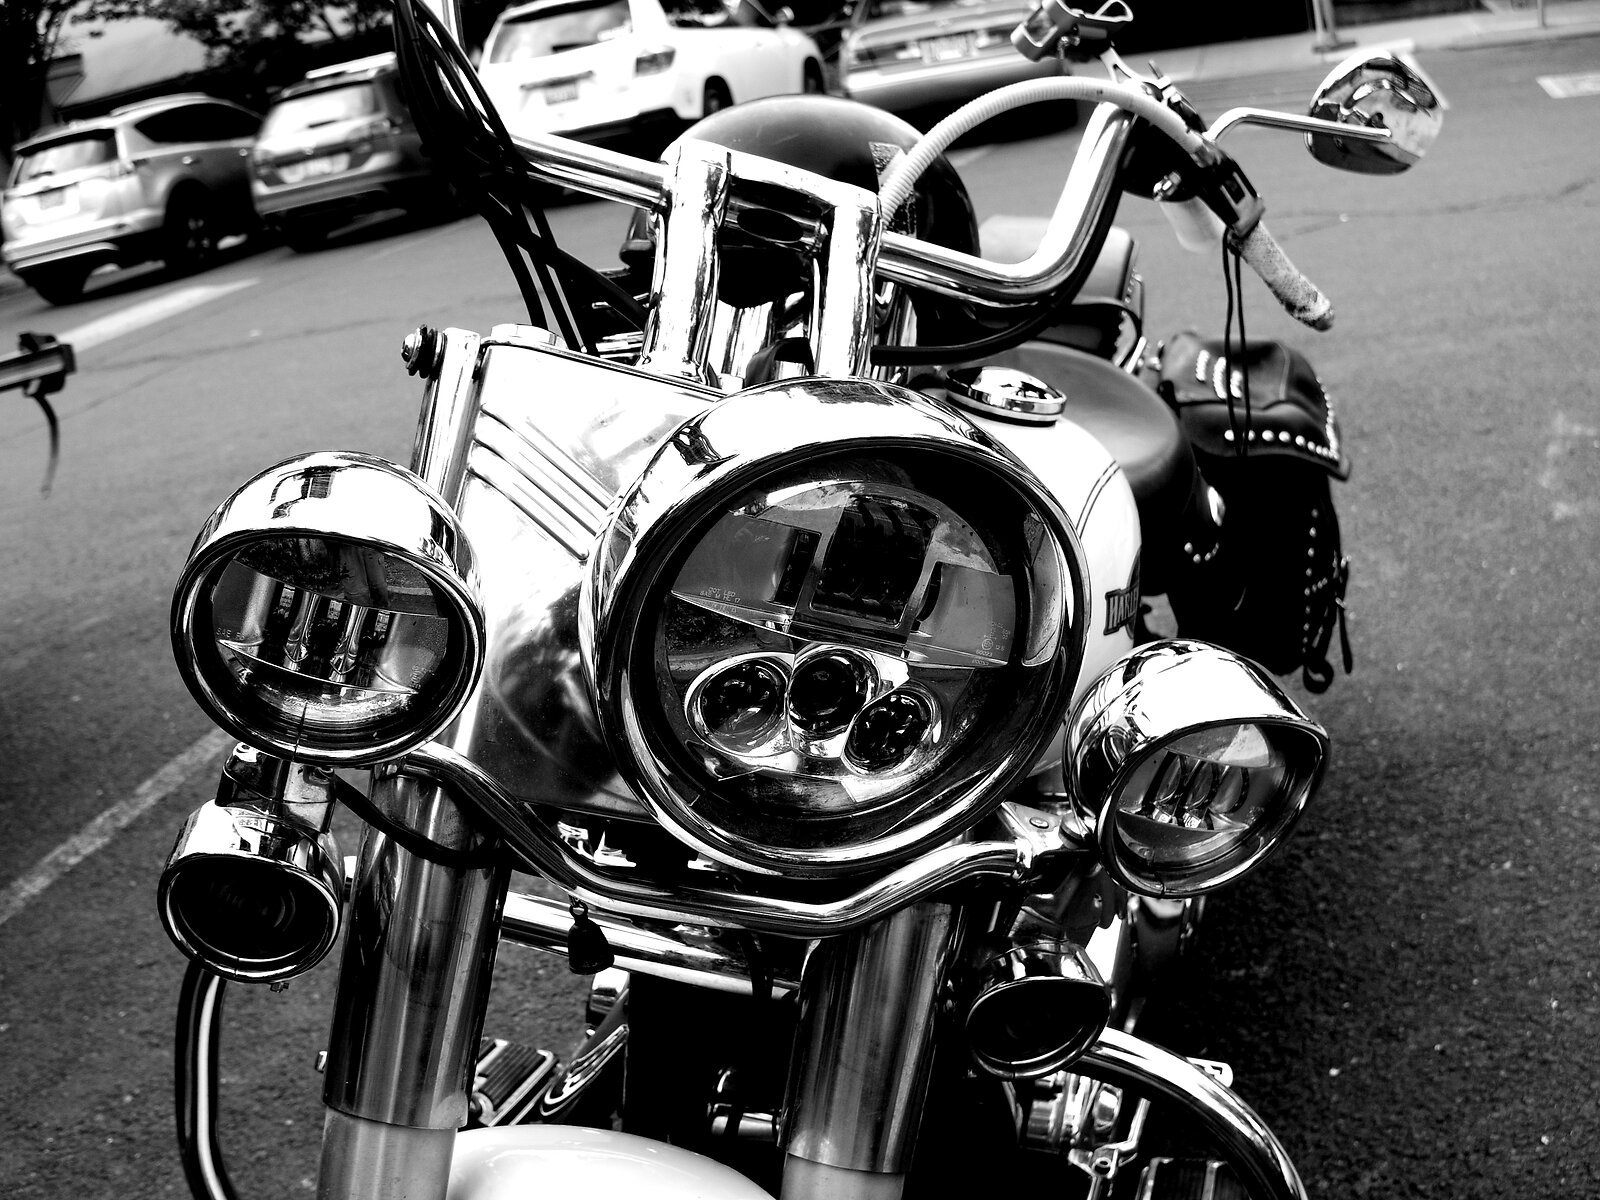 Q7+Jun8_21_Harley#2.jpg